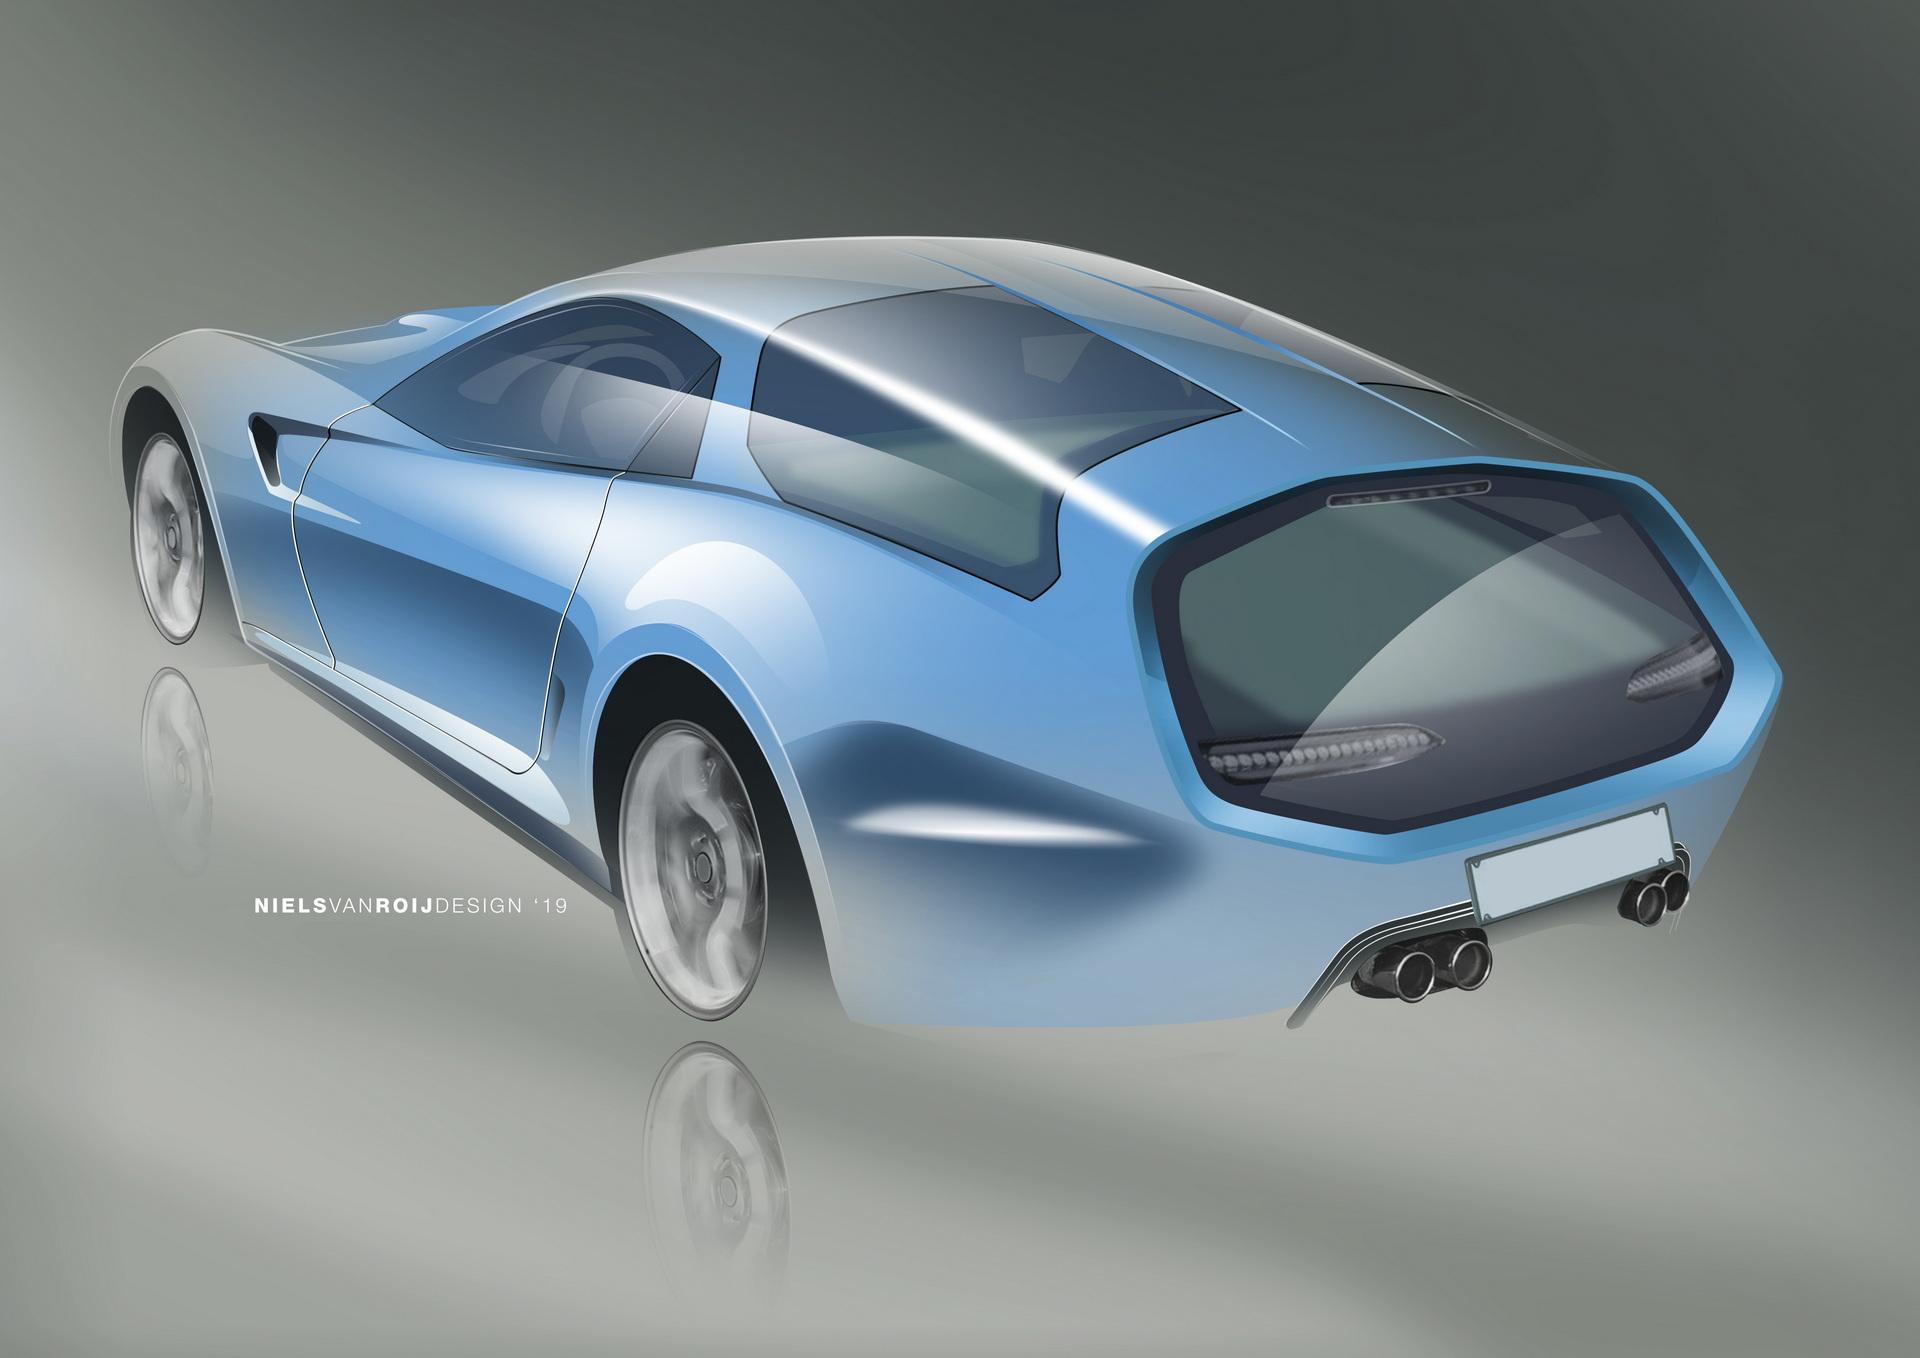 Ferrari-Daytona-Shooting-Brake-Hommage-by-Niels-van-Roij-Design-15